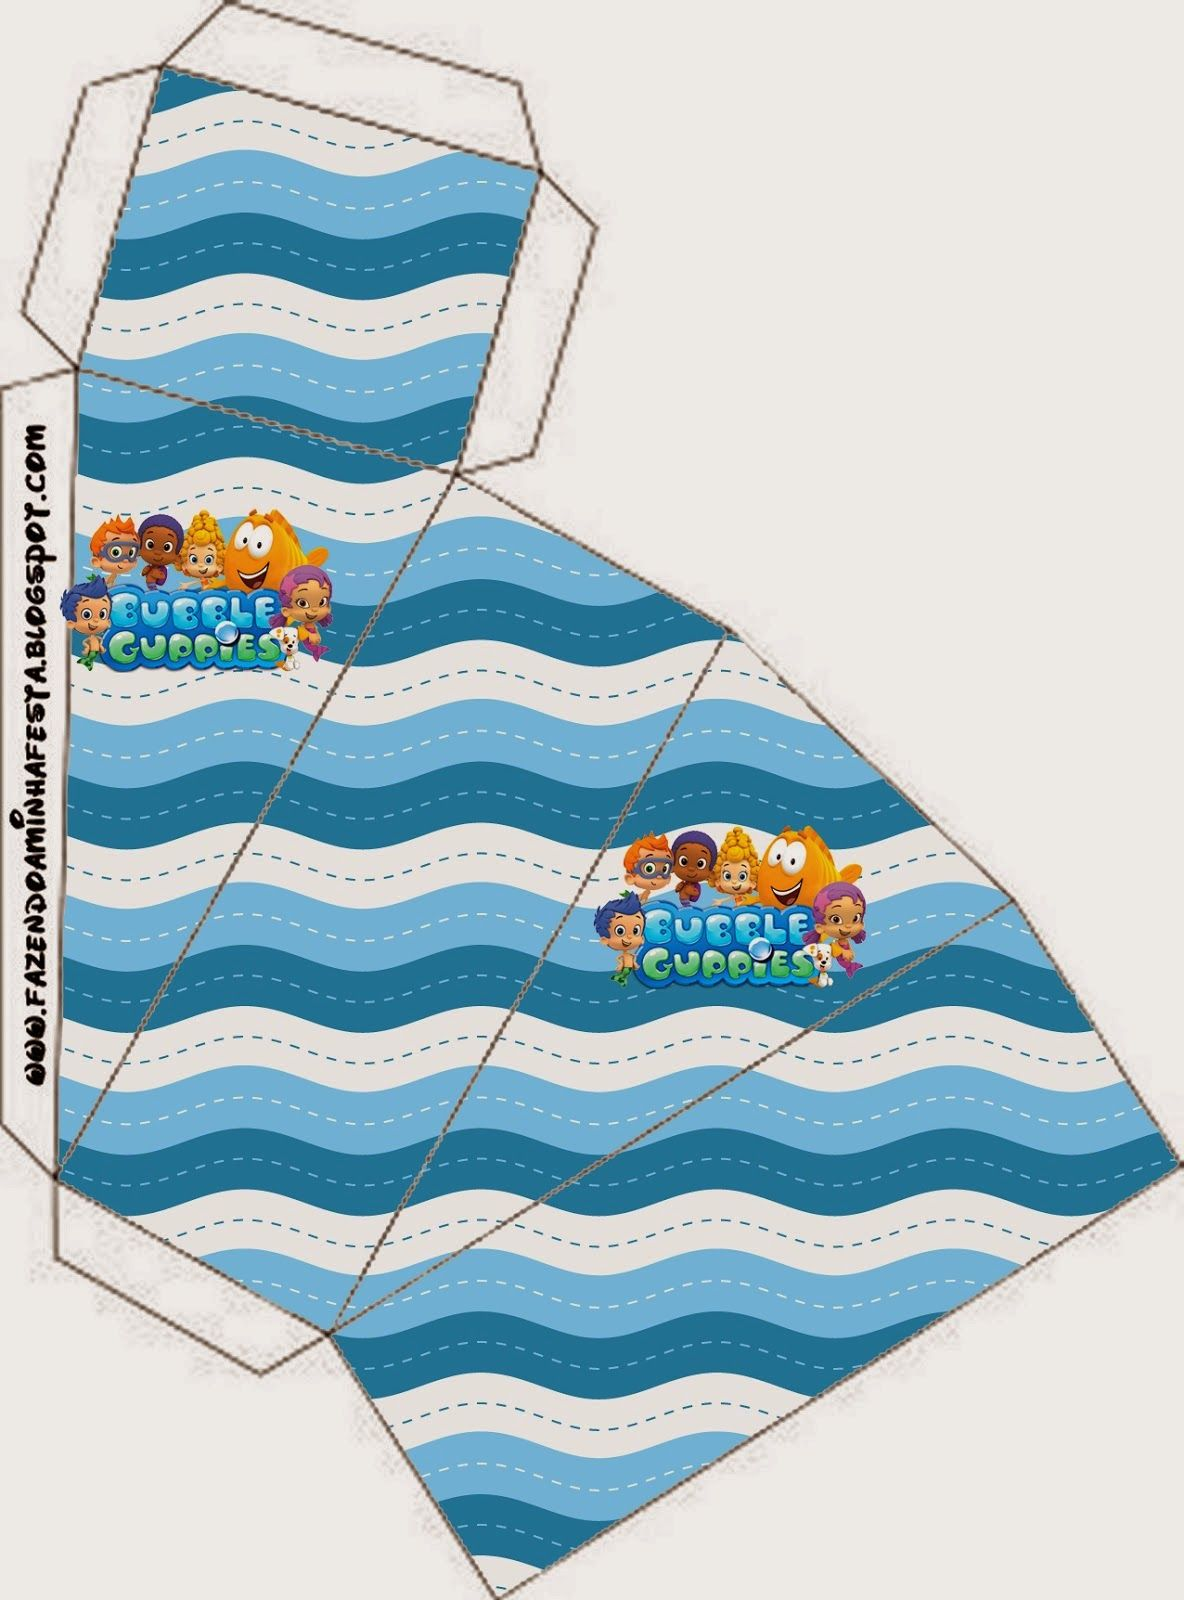 Bubble Guppies Free Printable Boxes. | Invitaciones | Pinterest ...